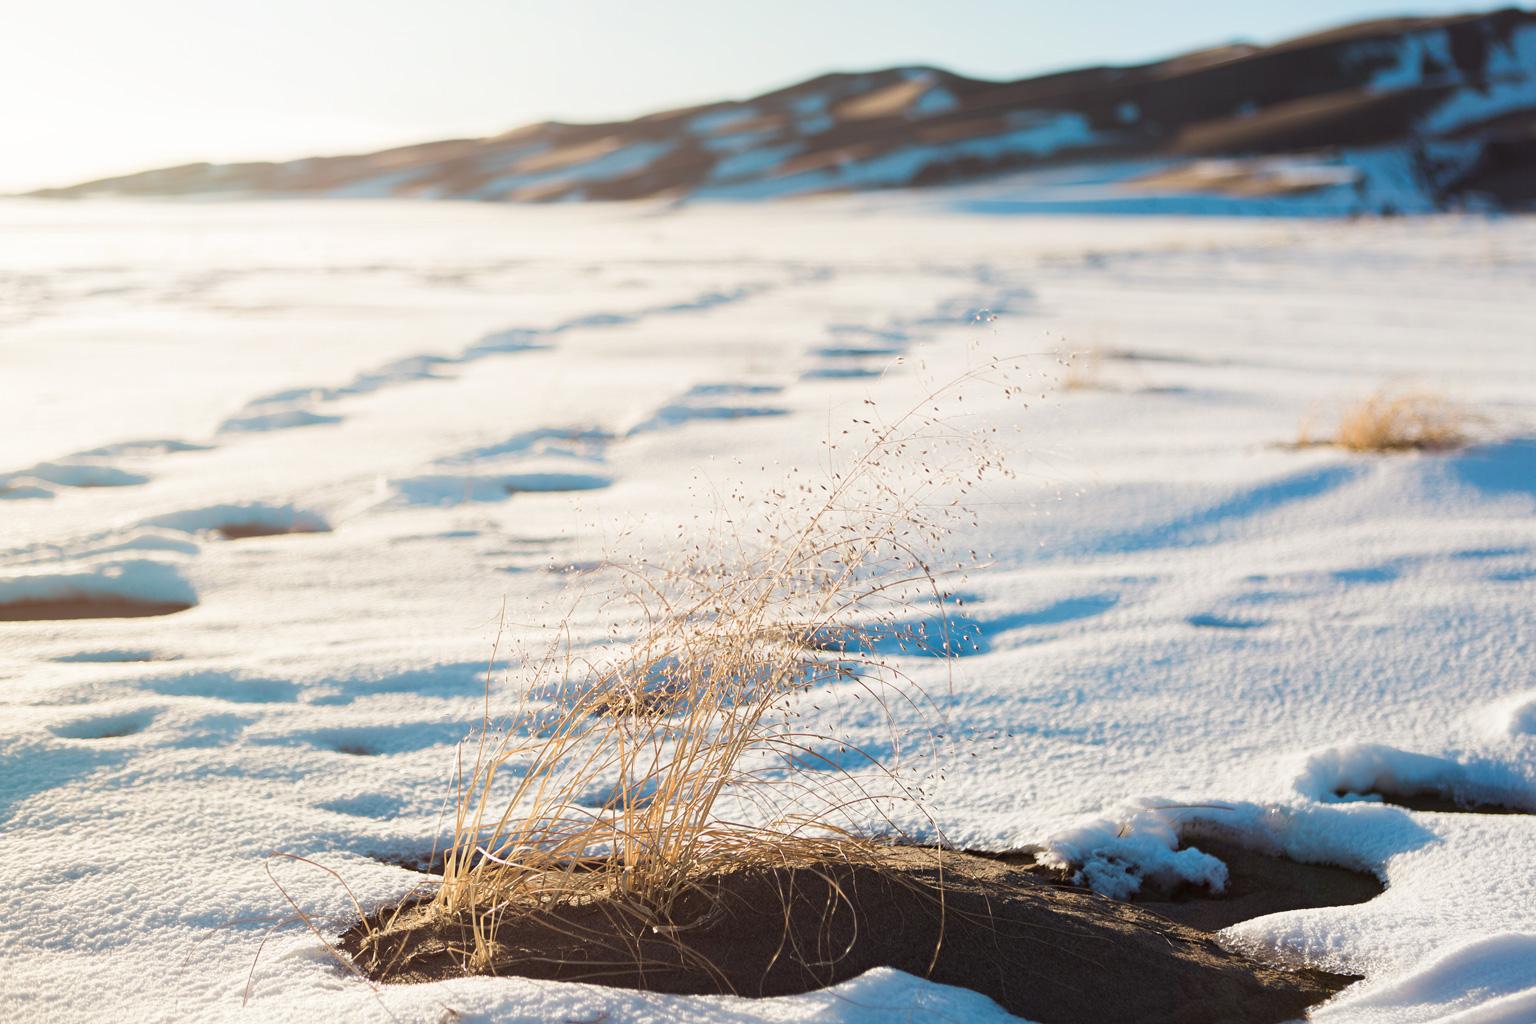 CindyGiovagnoli_Great_Sand_Dunes_National_Park_NPS_Colorado_roadtrip-011.jpg